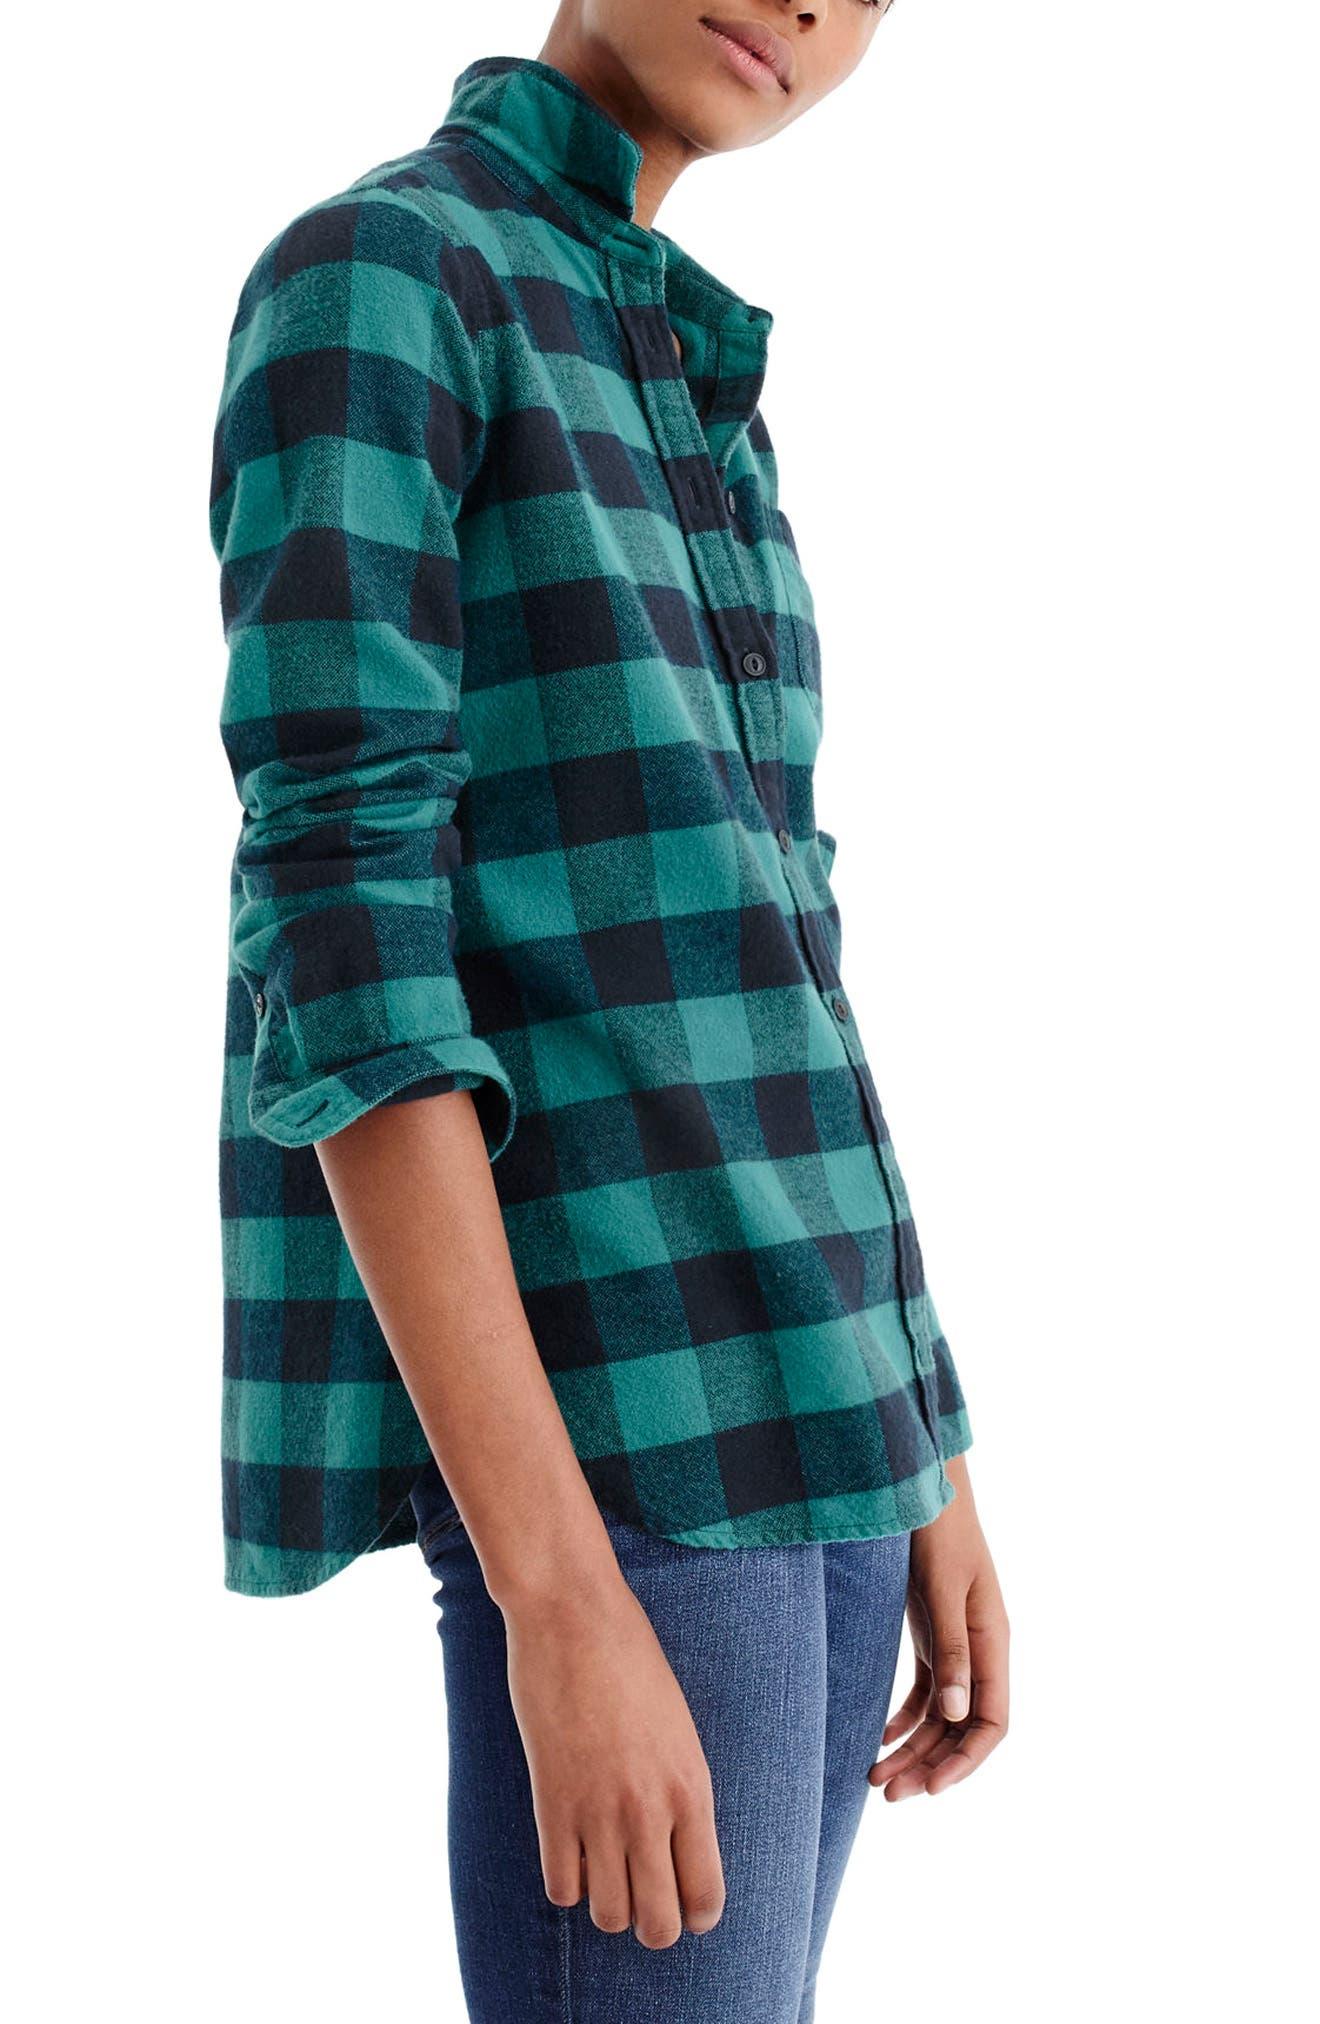 Buffalo Check Cotton & Wool Boy Shirt,                             Main thumbnail 1, color,                             309